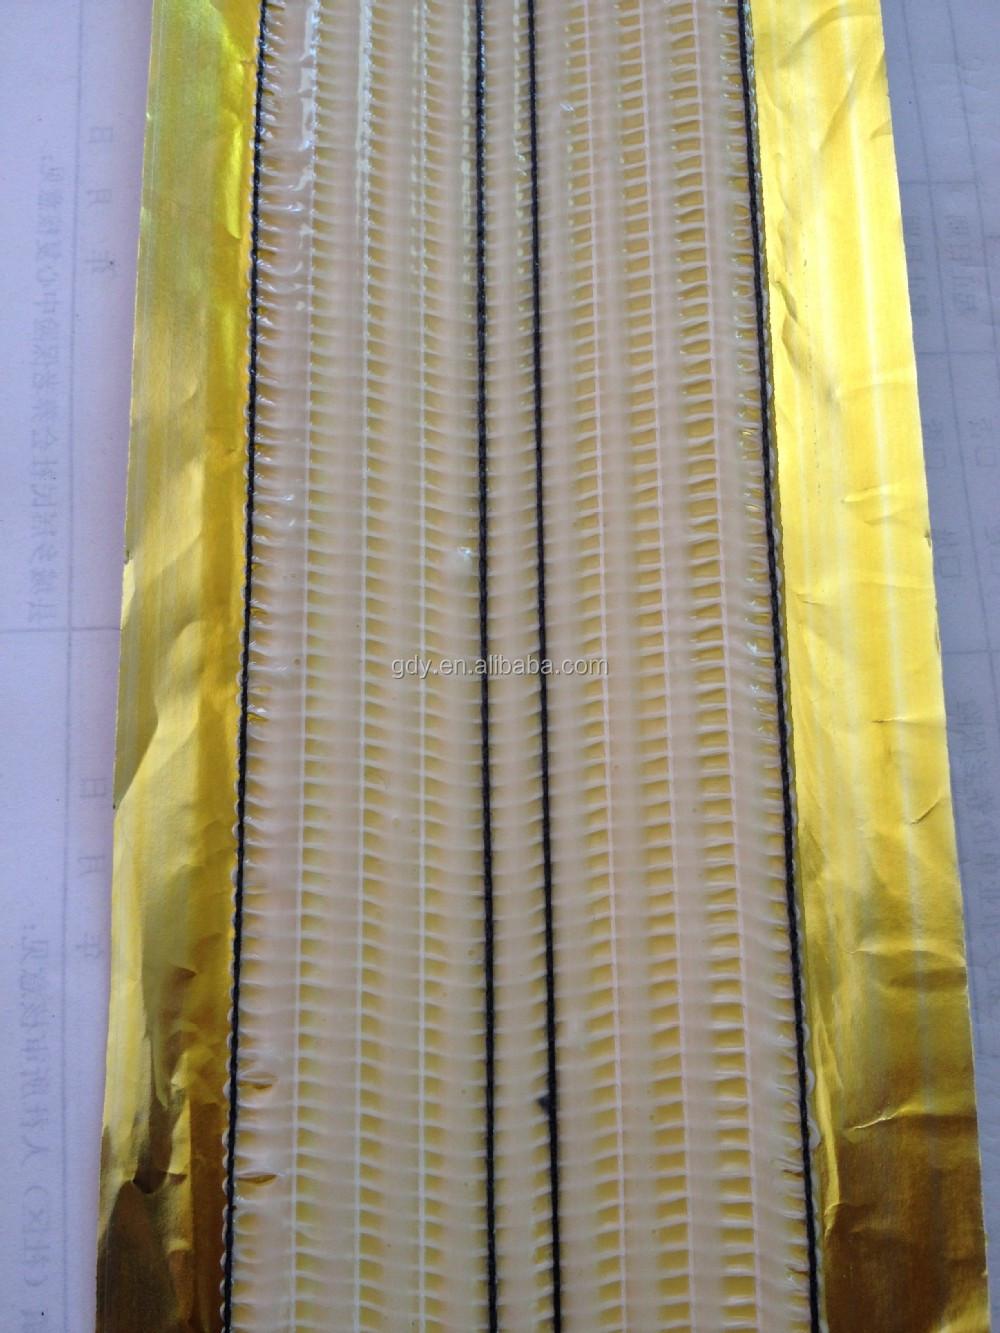 Gold heat seam carpet joining tape 20 mtr roll